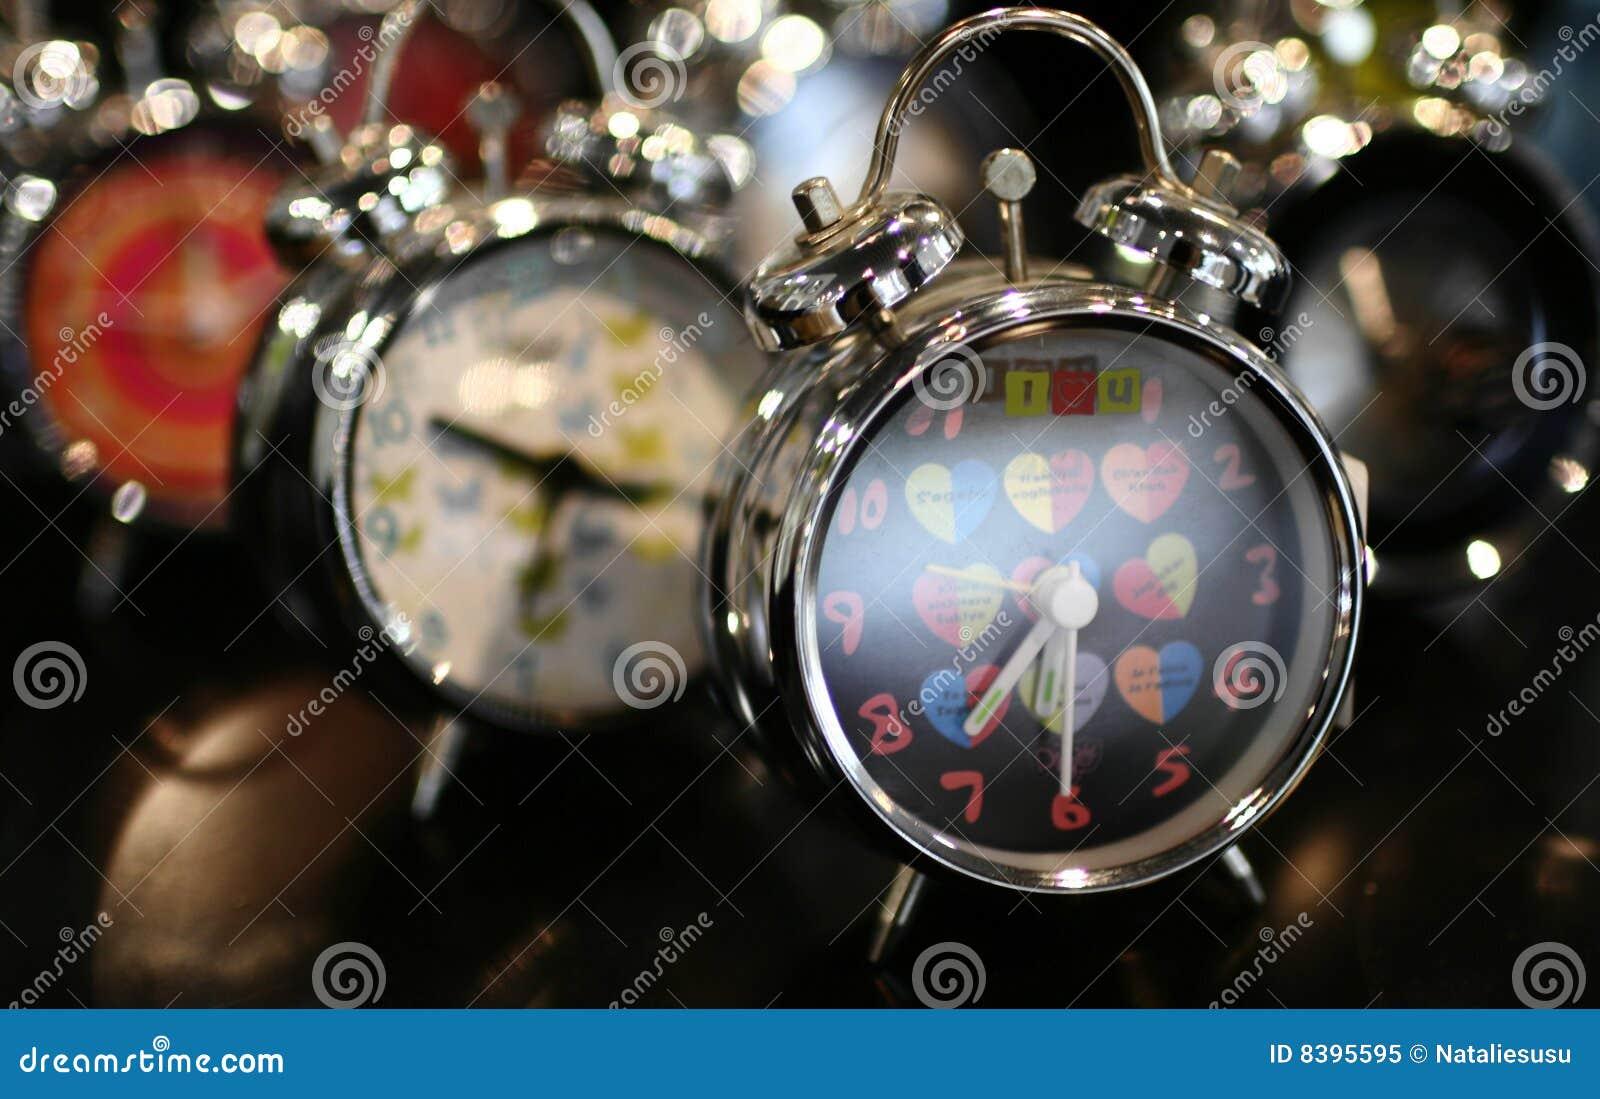 Download Clock stock image. Image of awake, deadline, macro, ring - 8395595